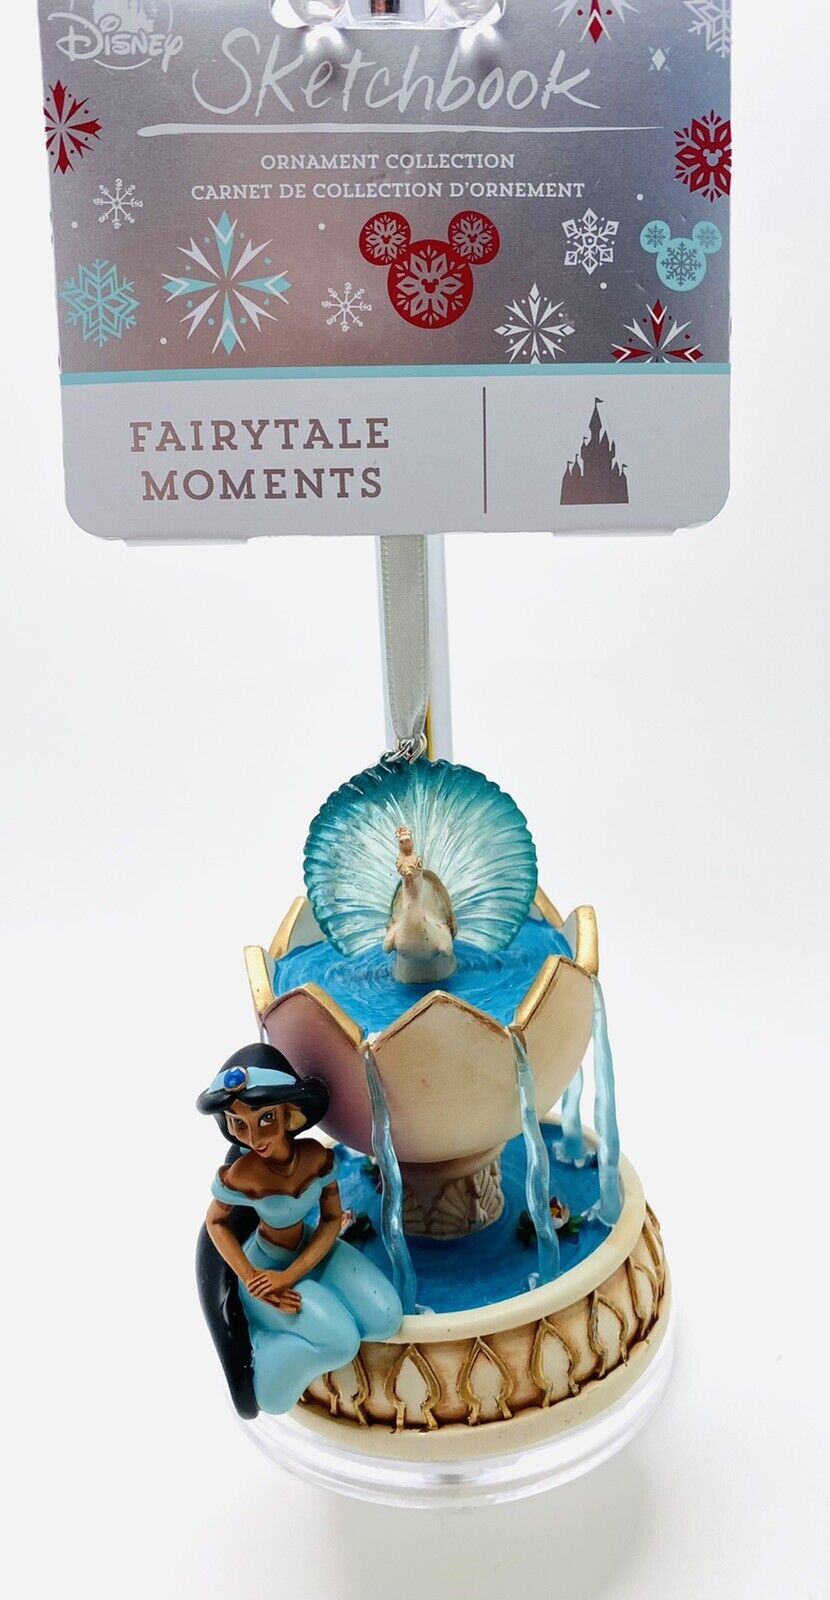 NEW Disney 2020 JASMINE Fairytale Moments Sketchbook Ornament Christmas